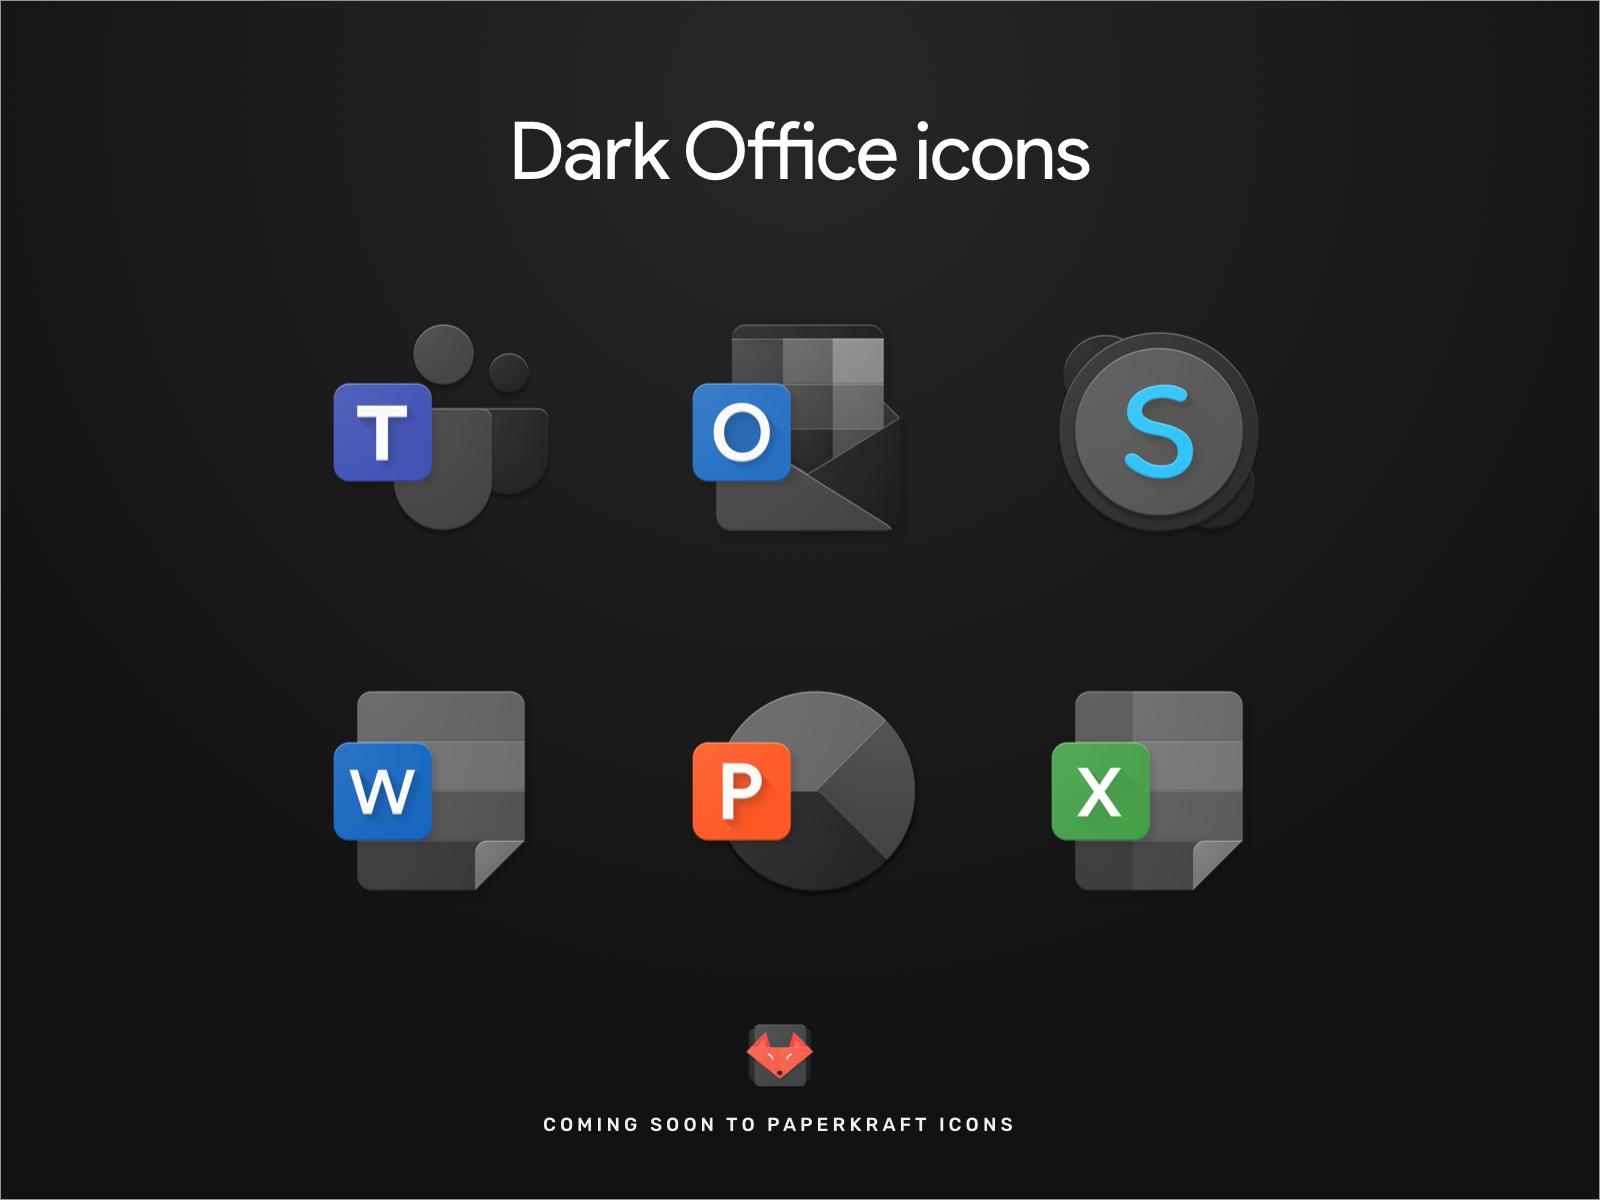 Microsoft Office icons Dark Office icon, Icon